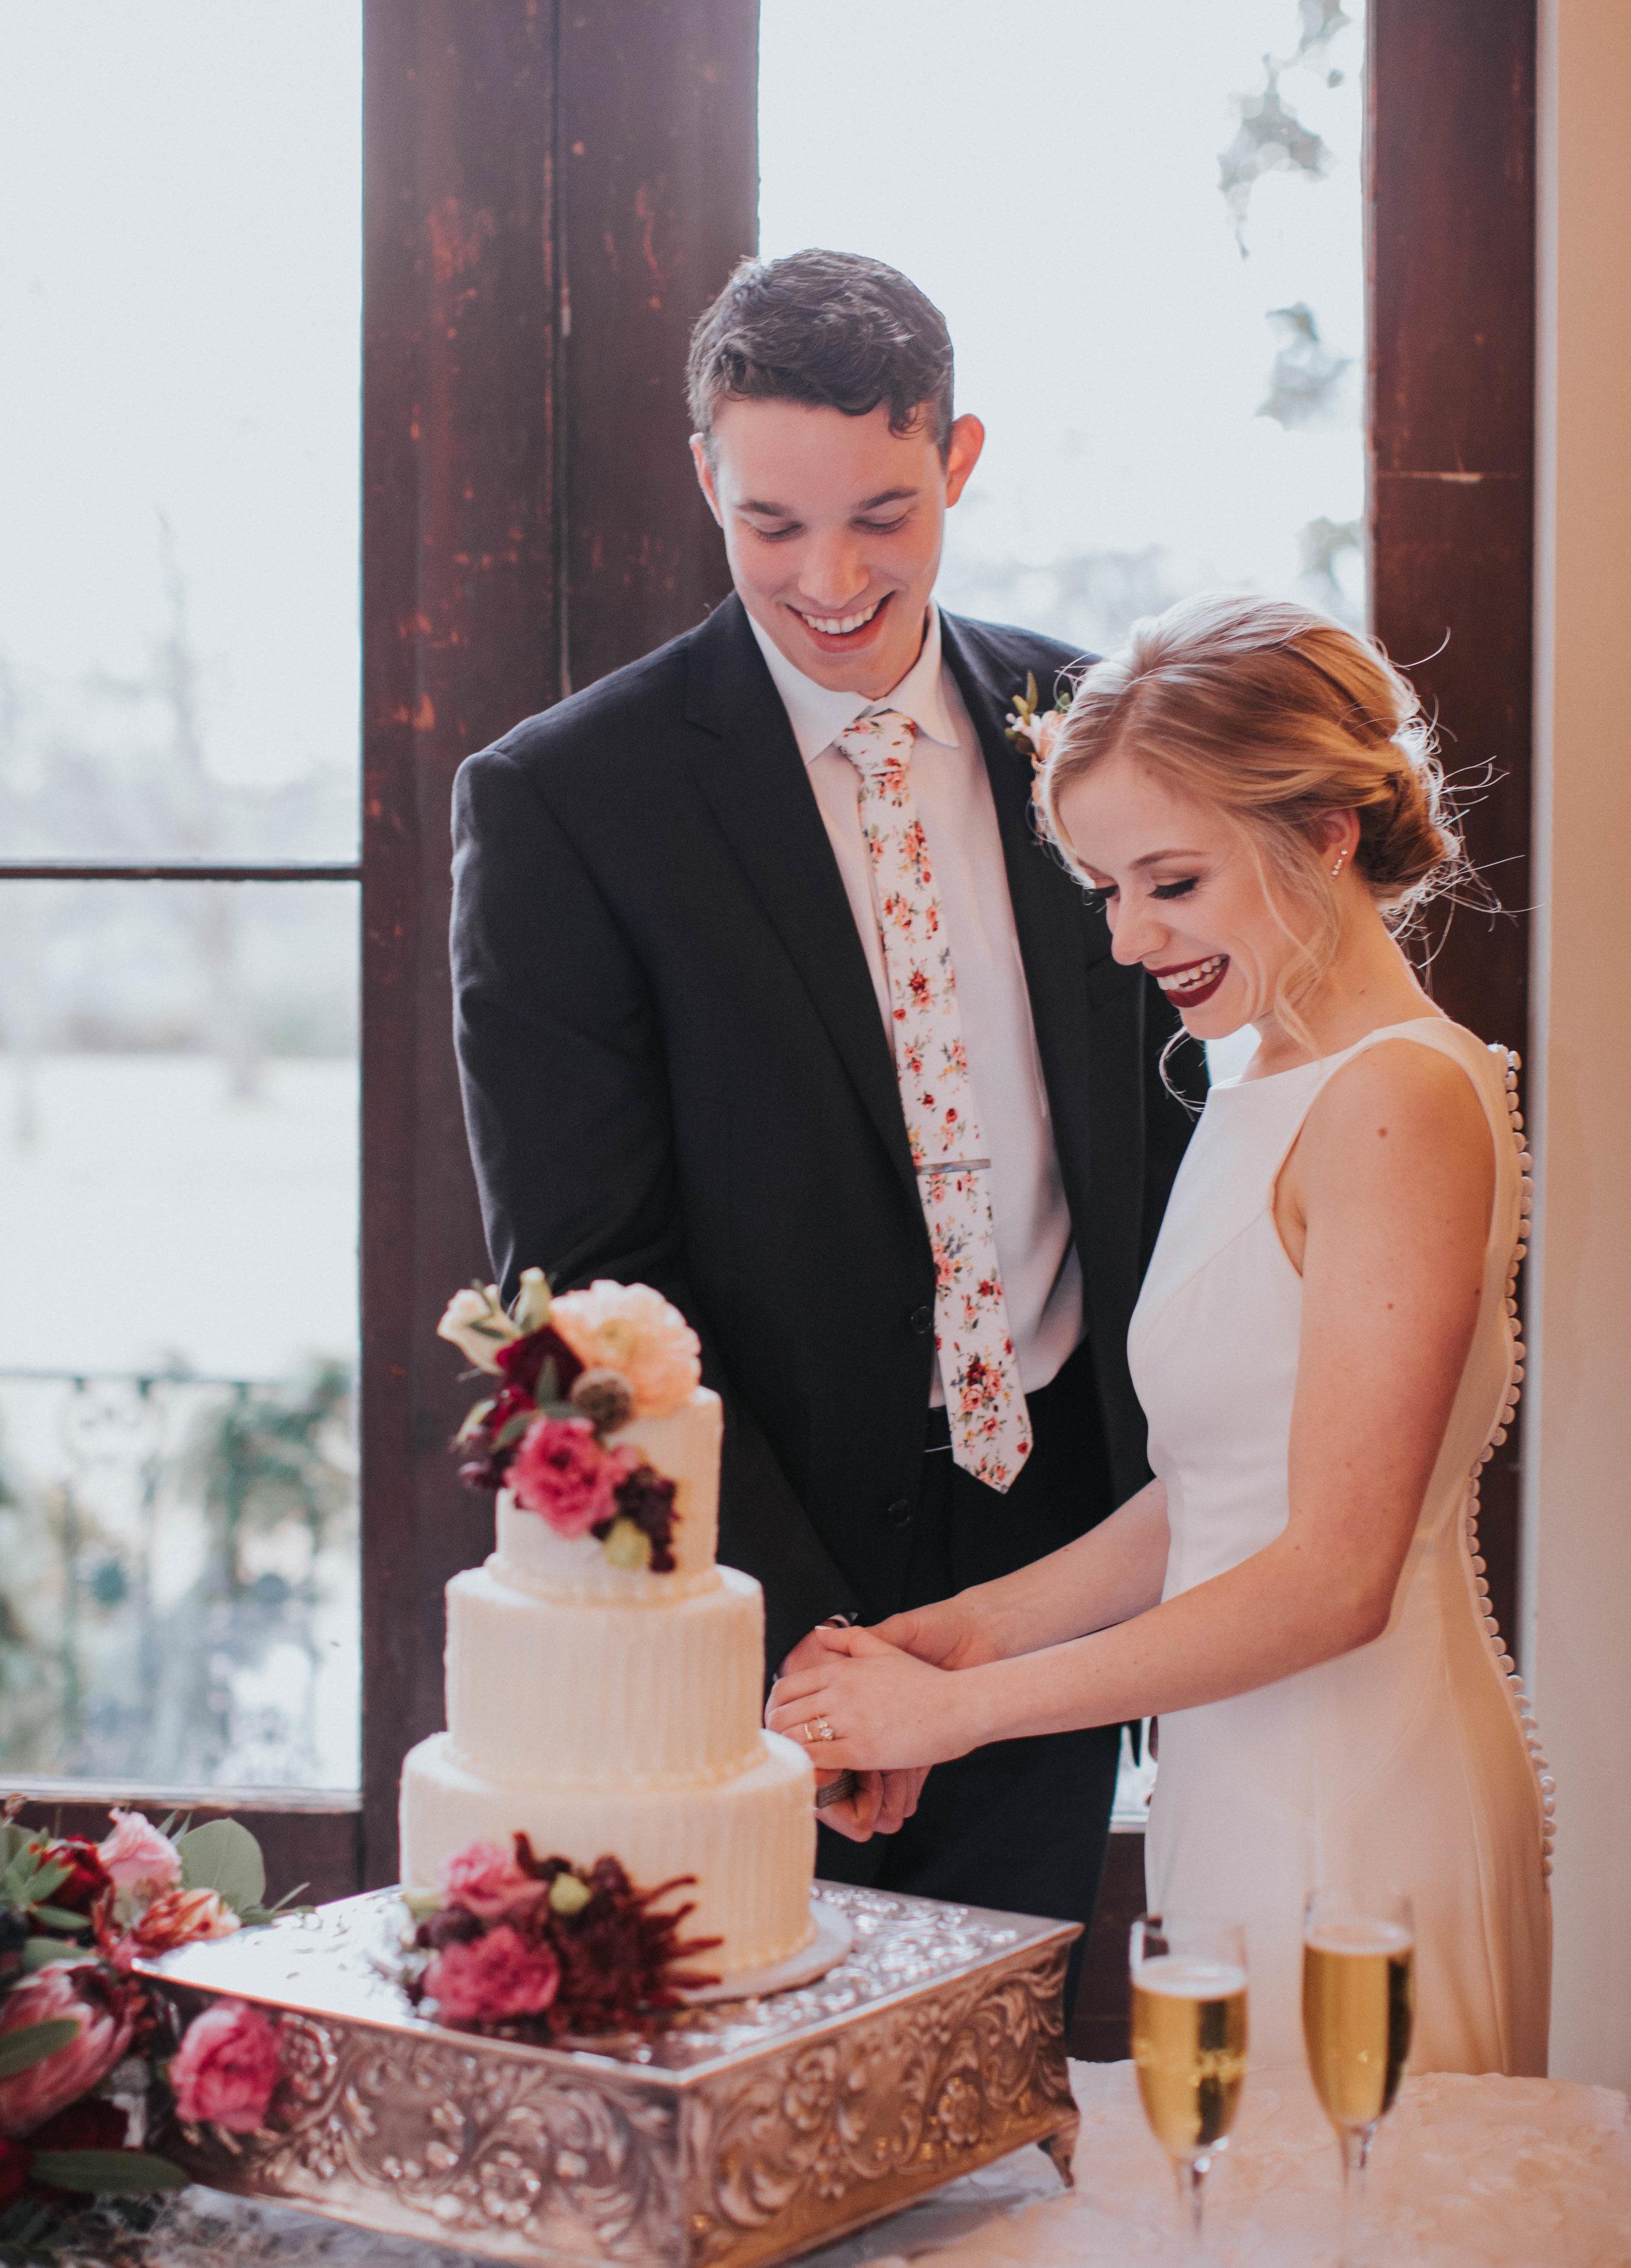 Charis_Lauren_Romantic_Wedding_Photographer_Nashville_03A1582.jpg